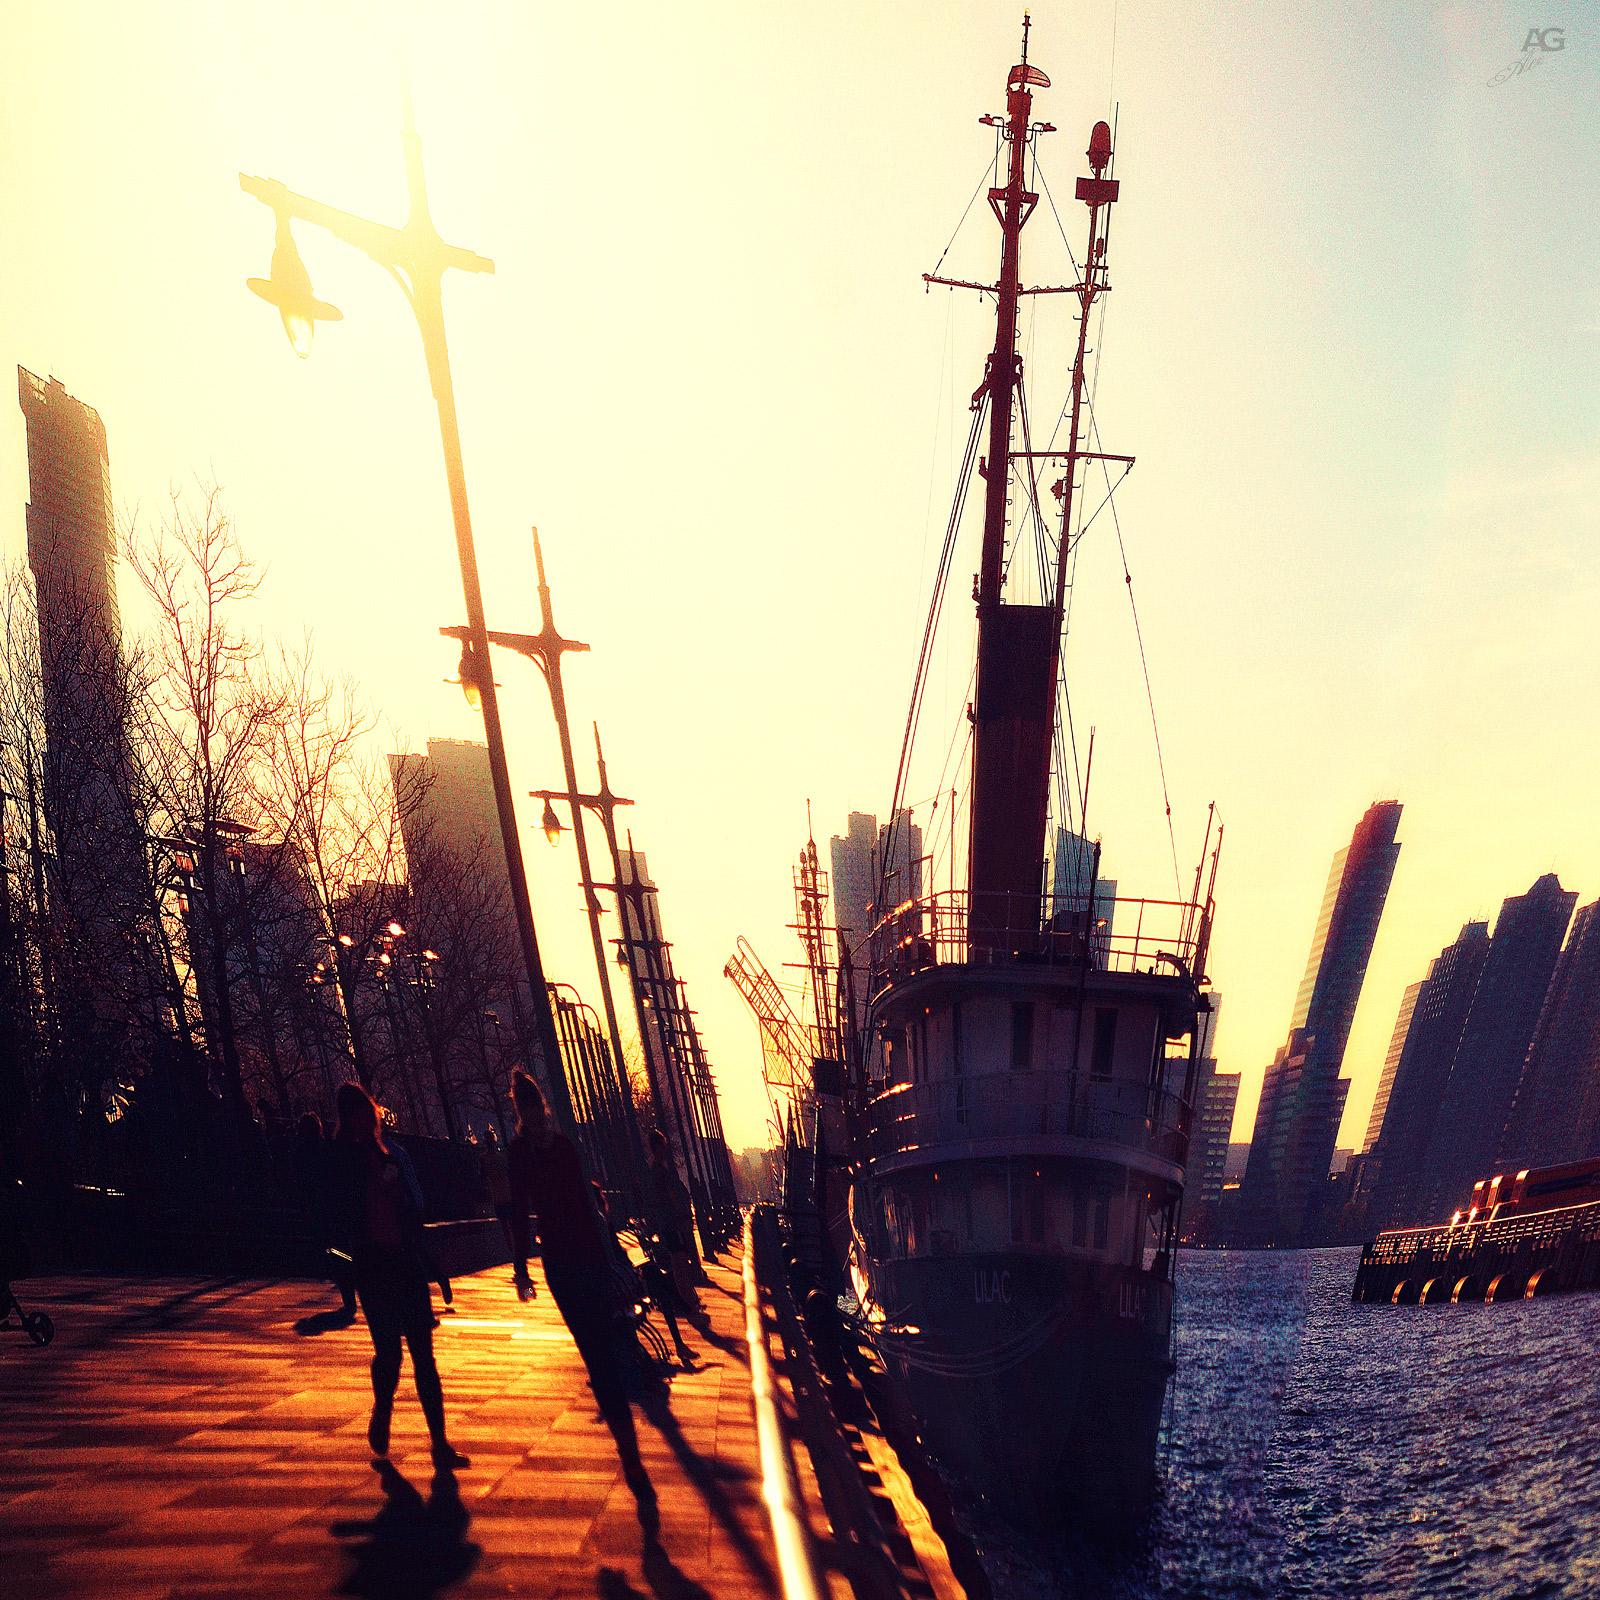 ShipAgainstTheSunOnHudson_warp_1600